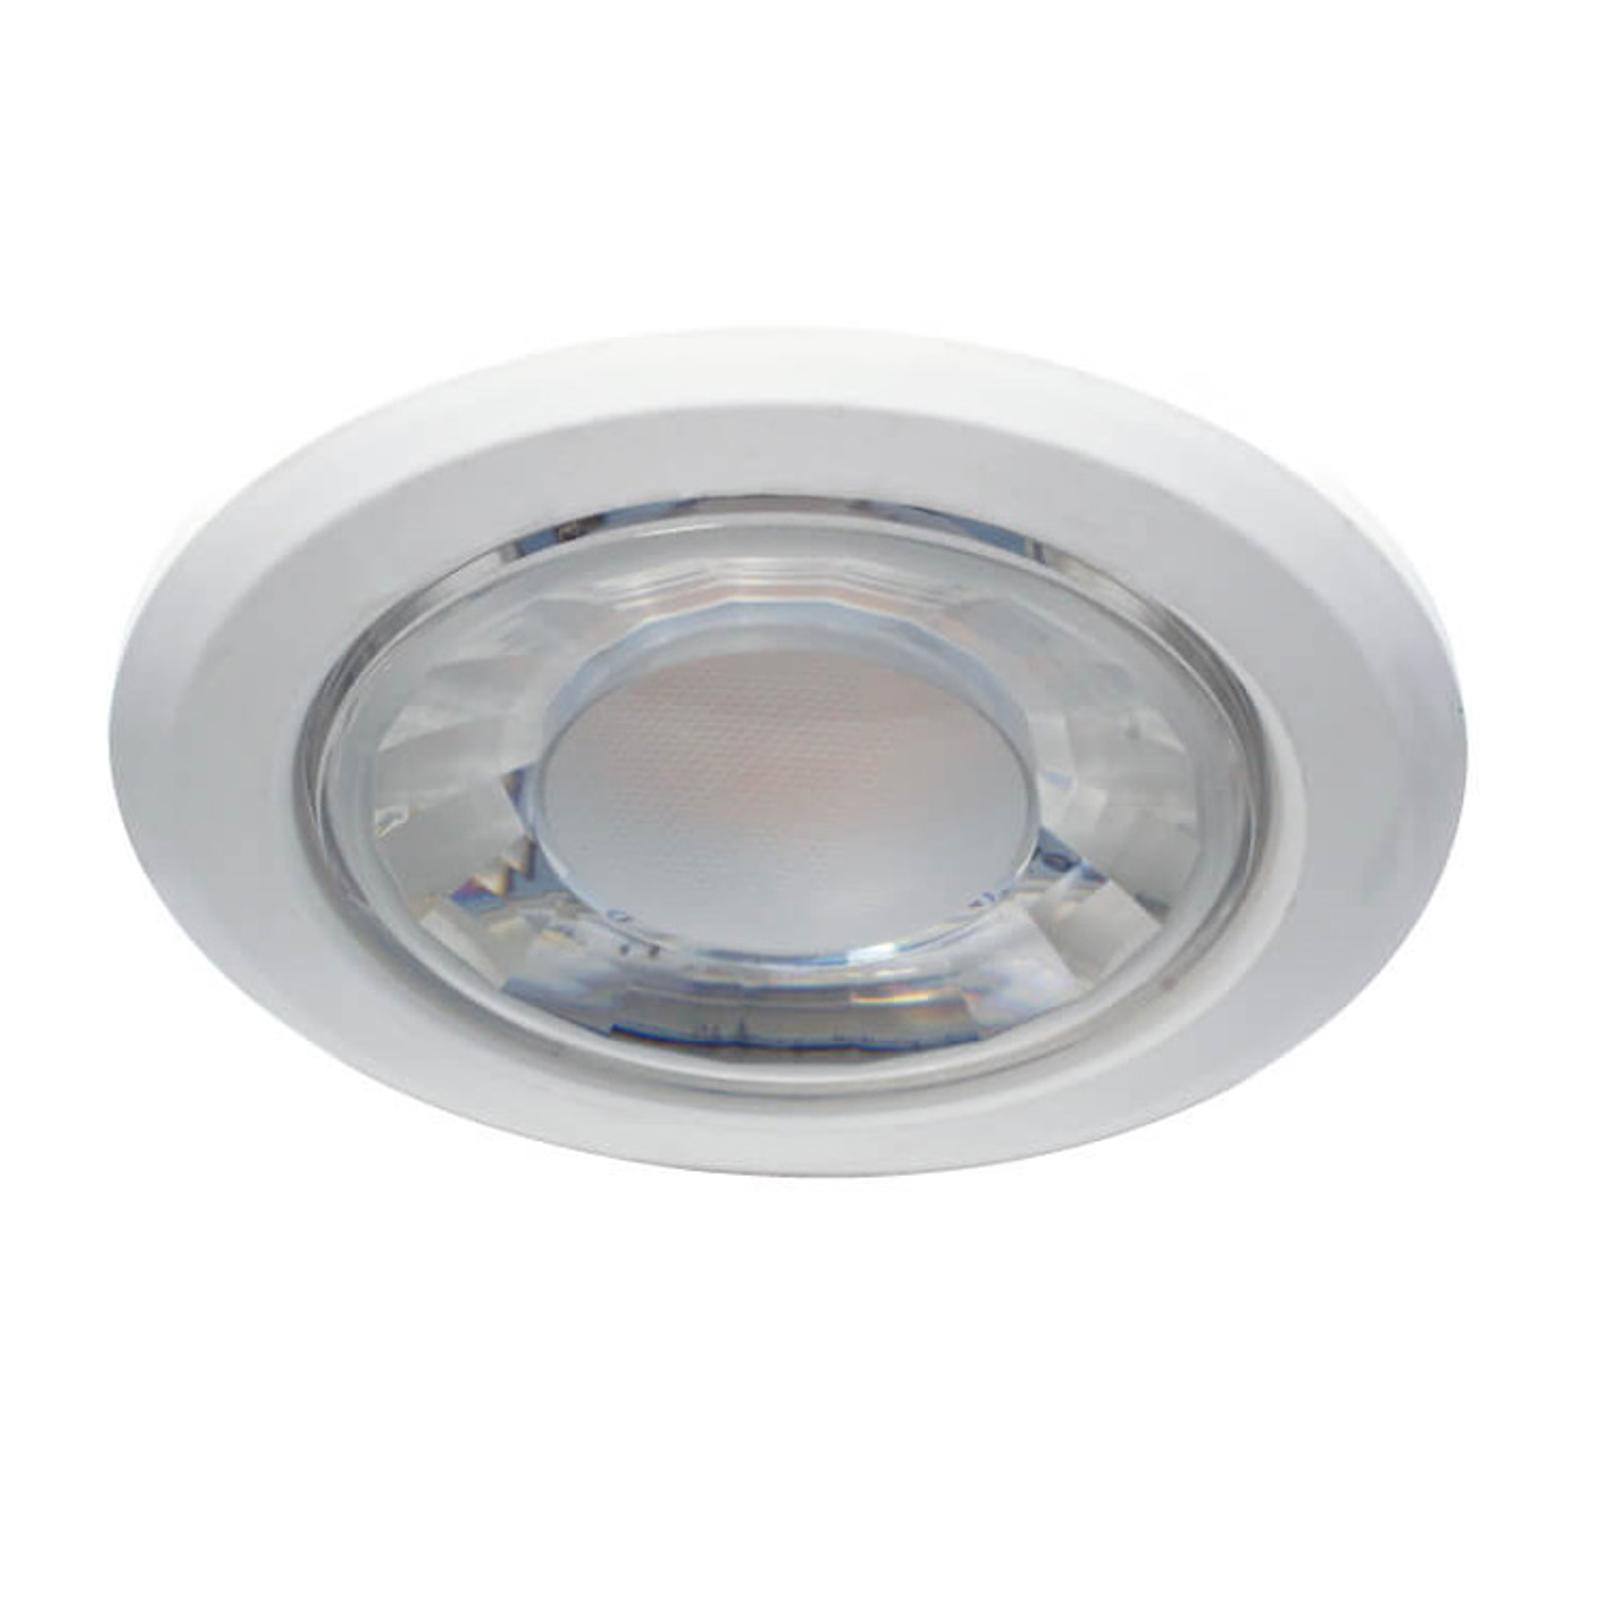 LED-Einbaustrahler Dekto 10,5cm 60° 15W 4.000K